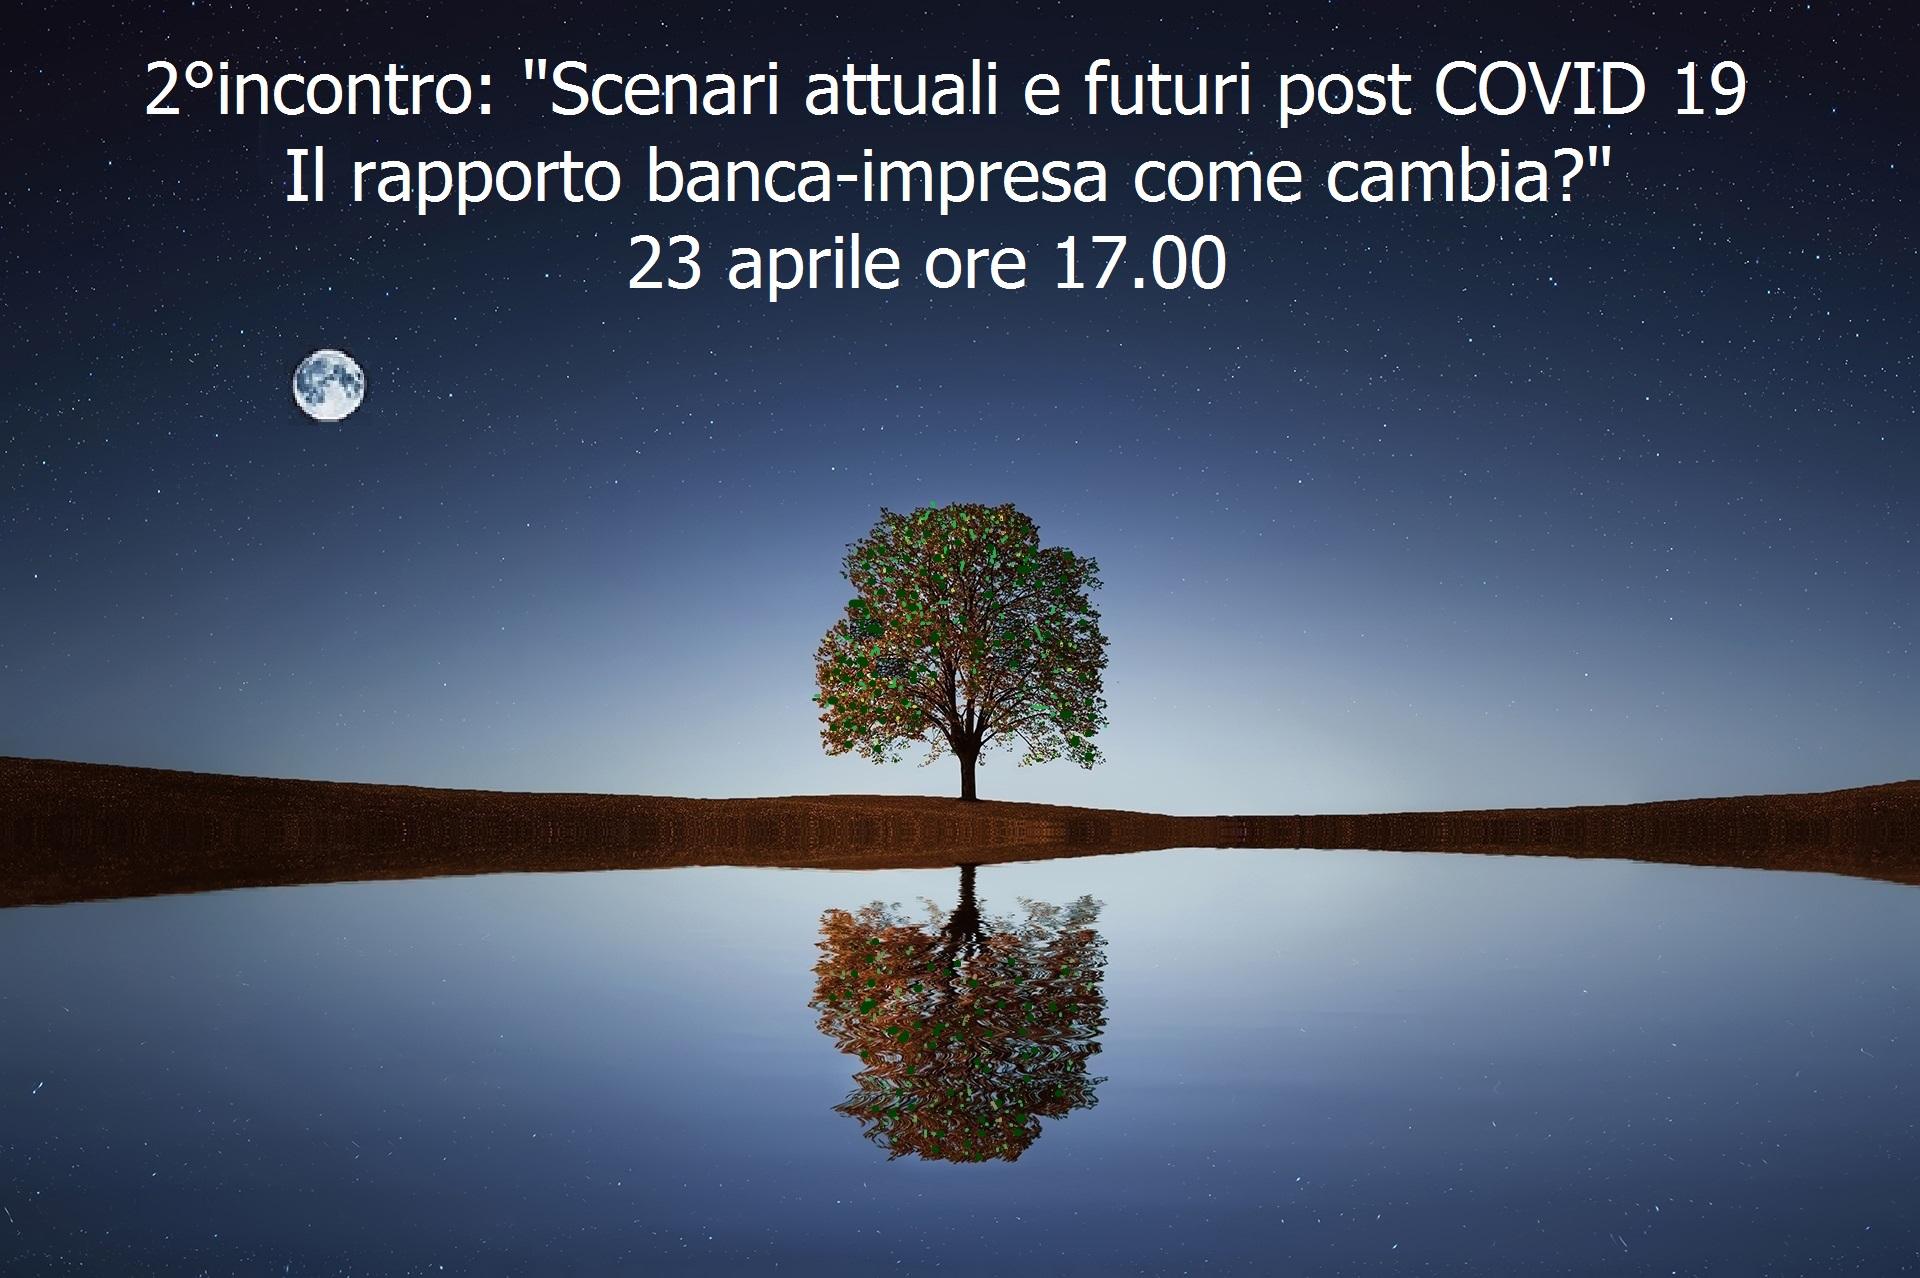 albero-2-incontro.jpg